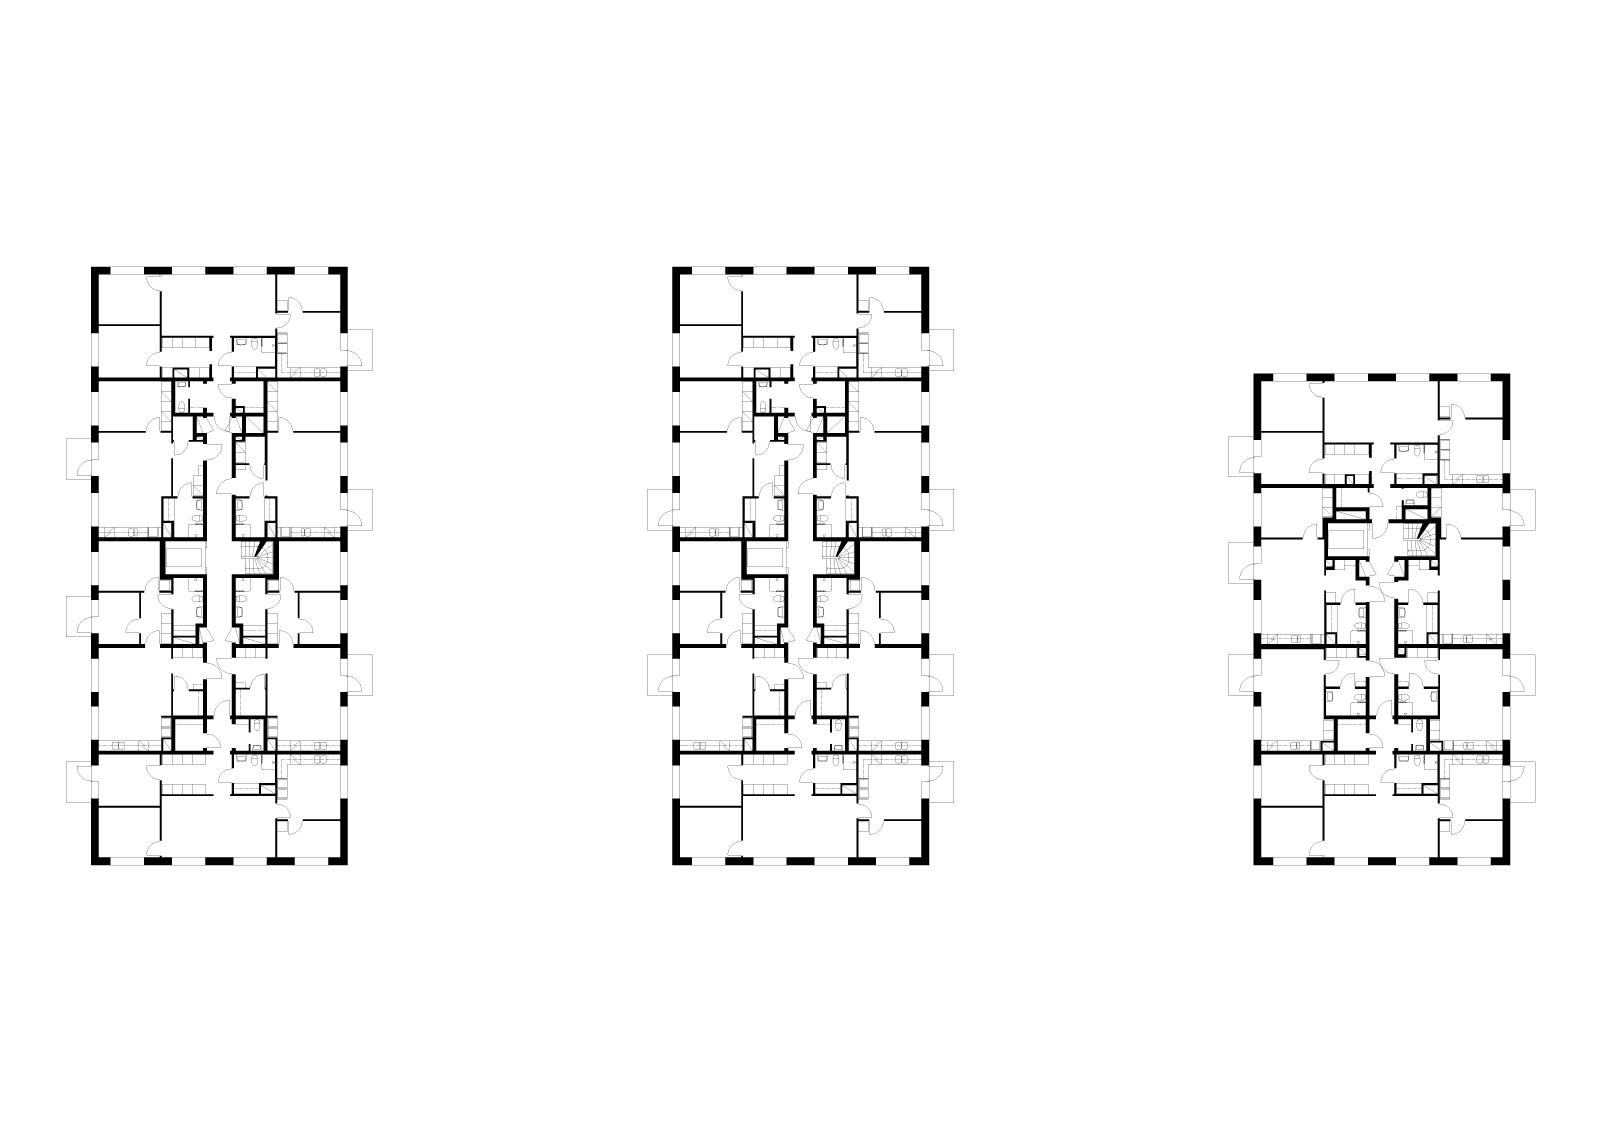 stampelfargentypplan.jpg